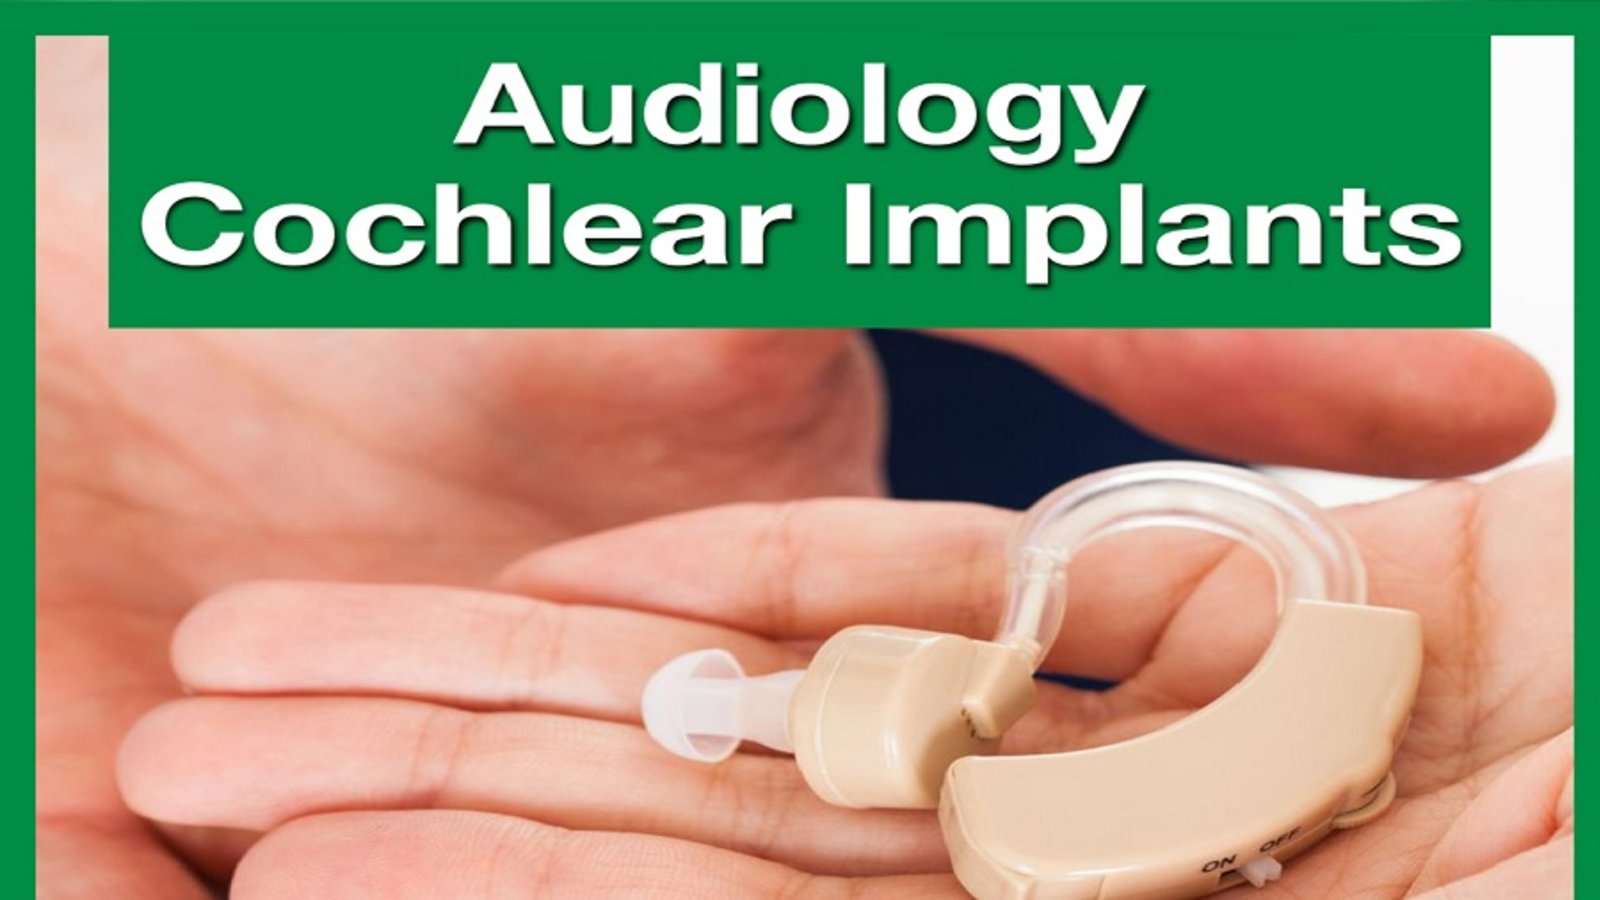 Audiology & Otology – Cochlear Implants